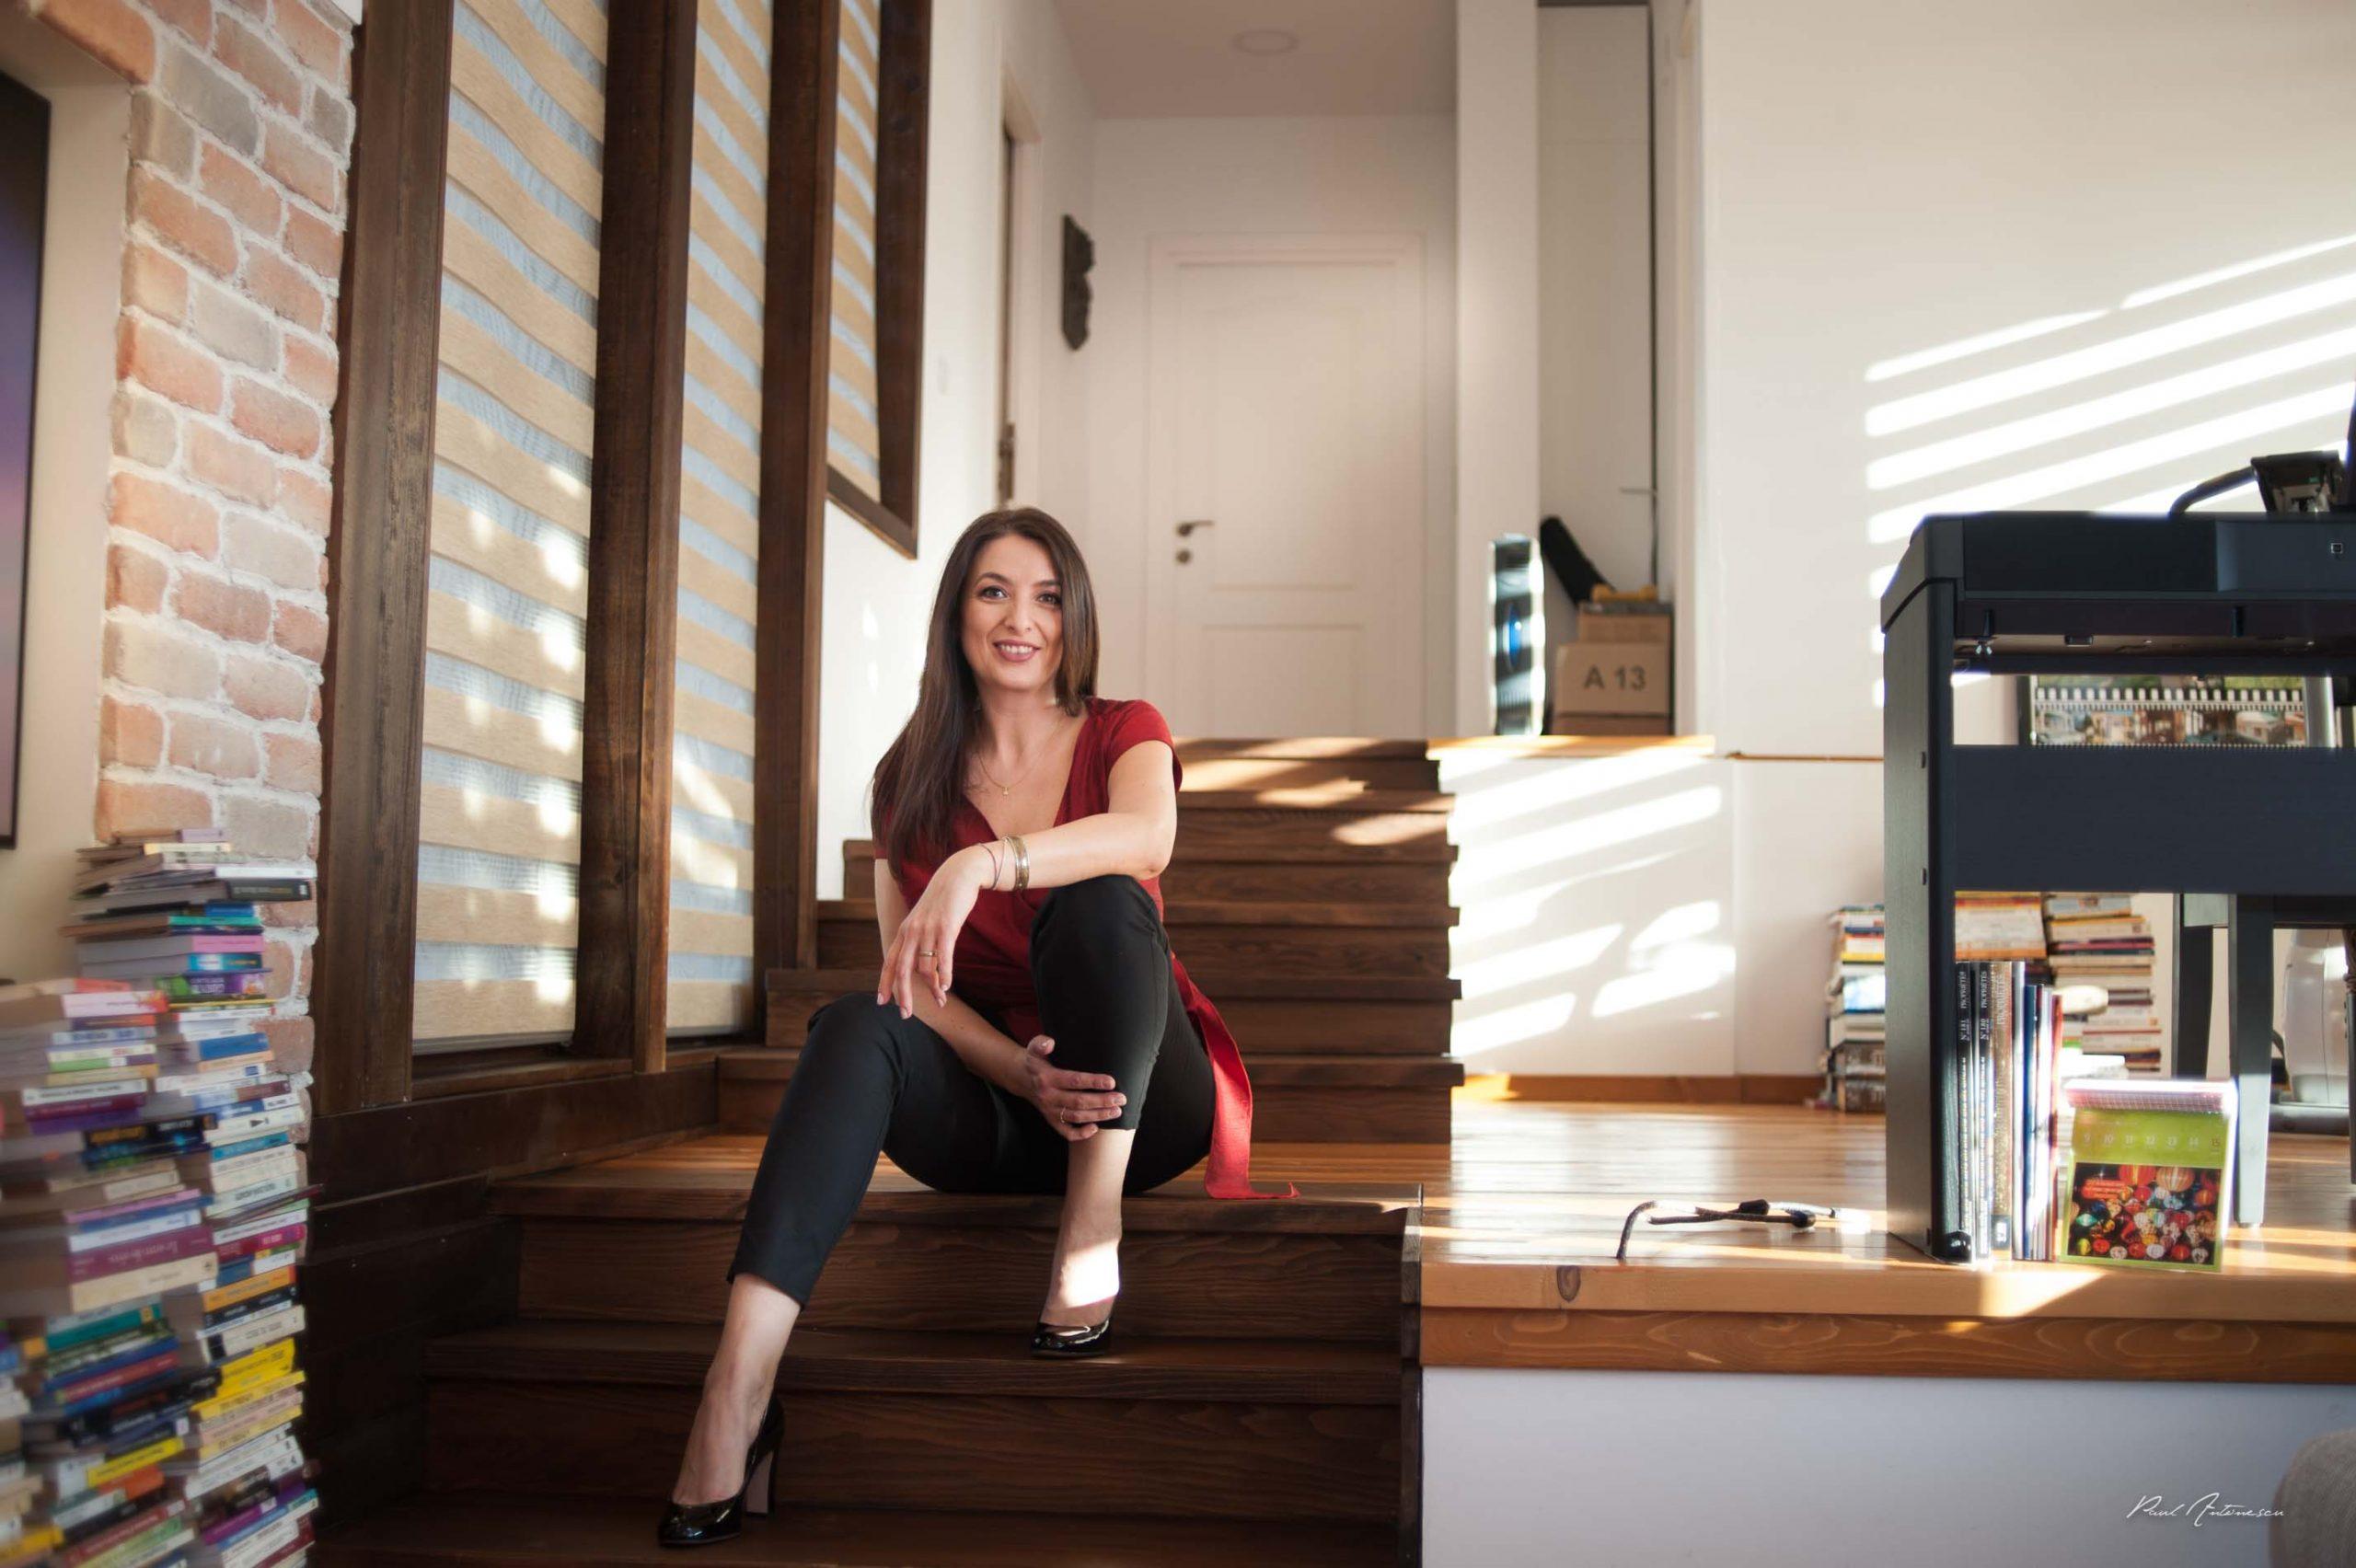 Doamna fotografiata minimalist, razand, cu par lung, negru, la lumina naturala, pe trepte, in casa.